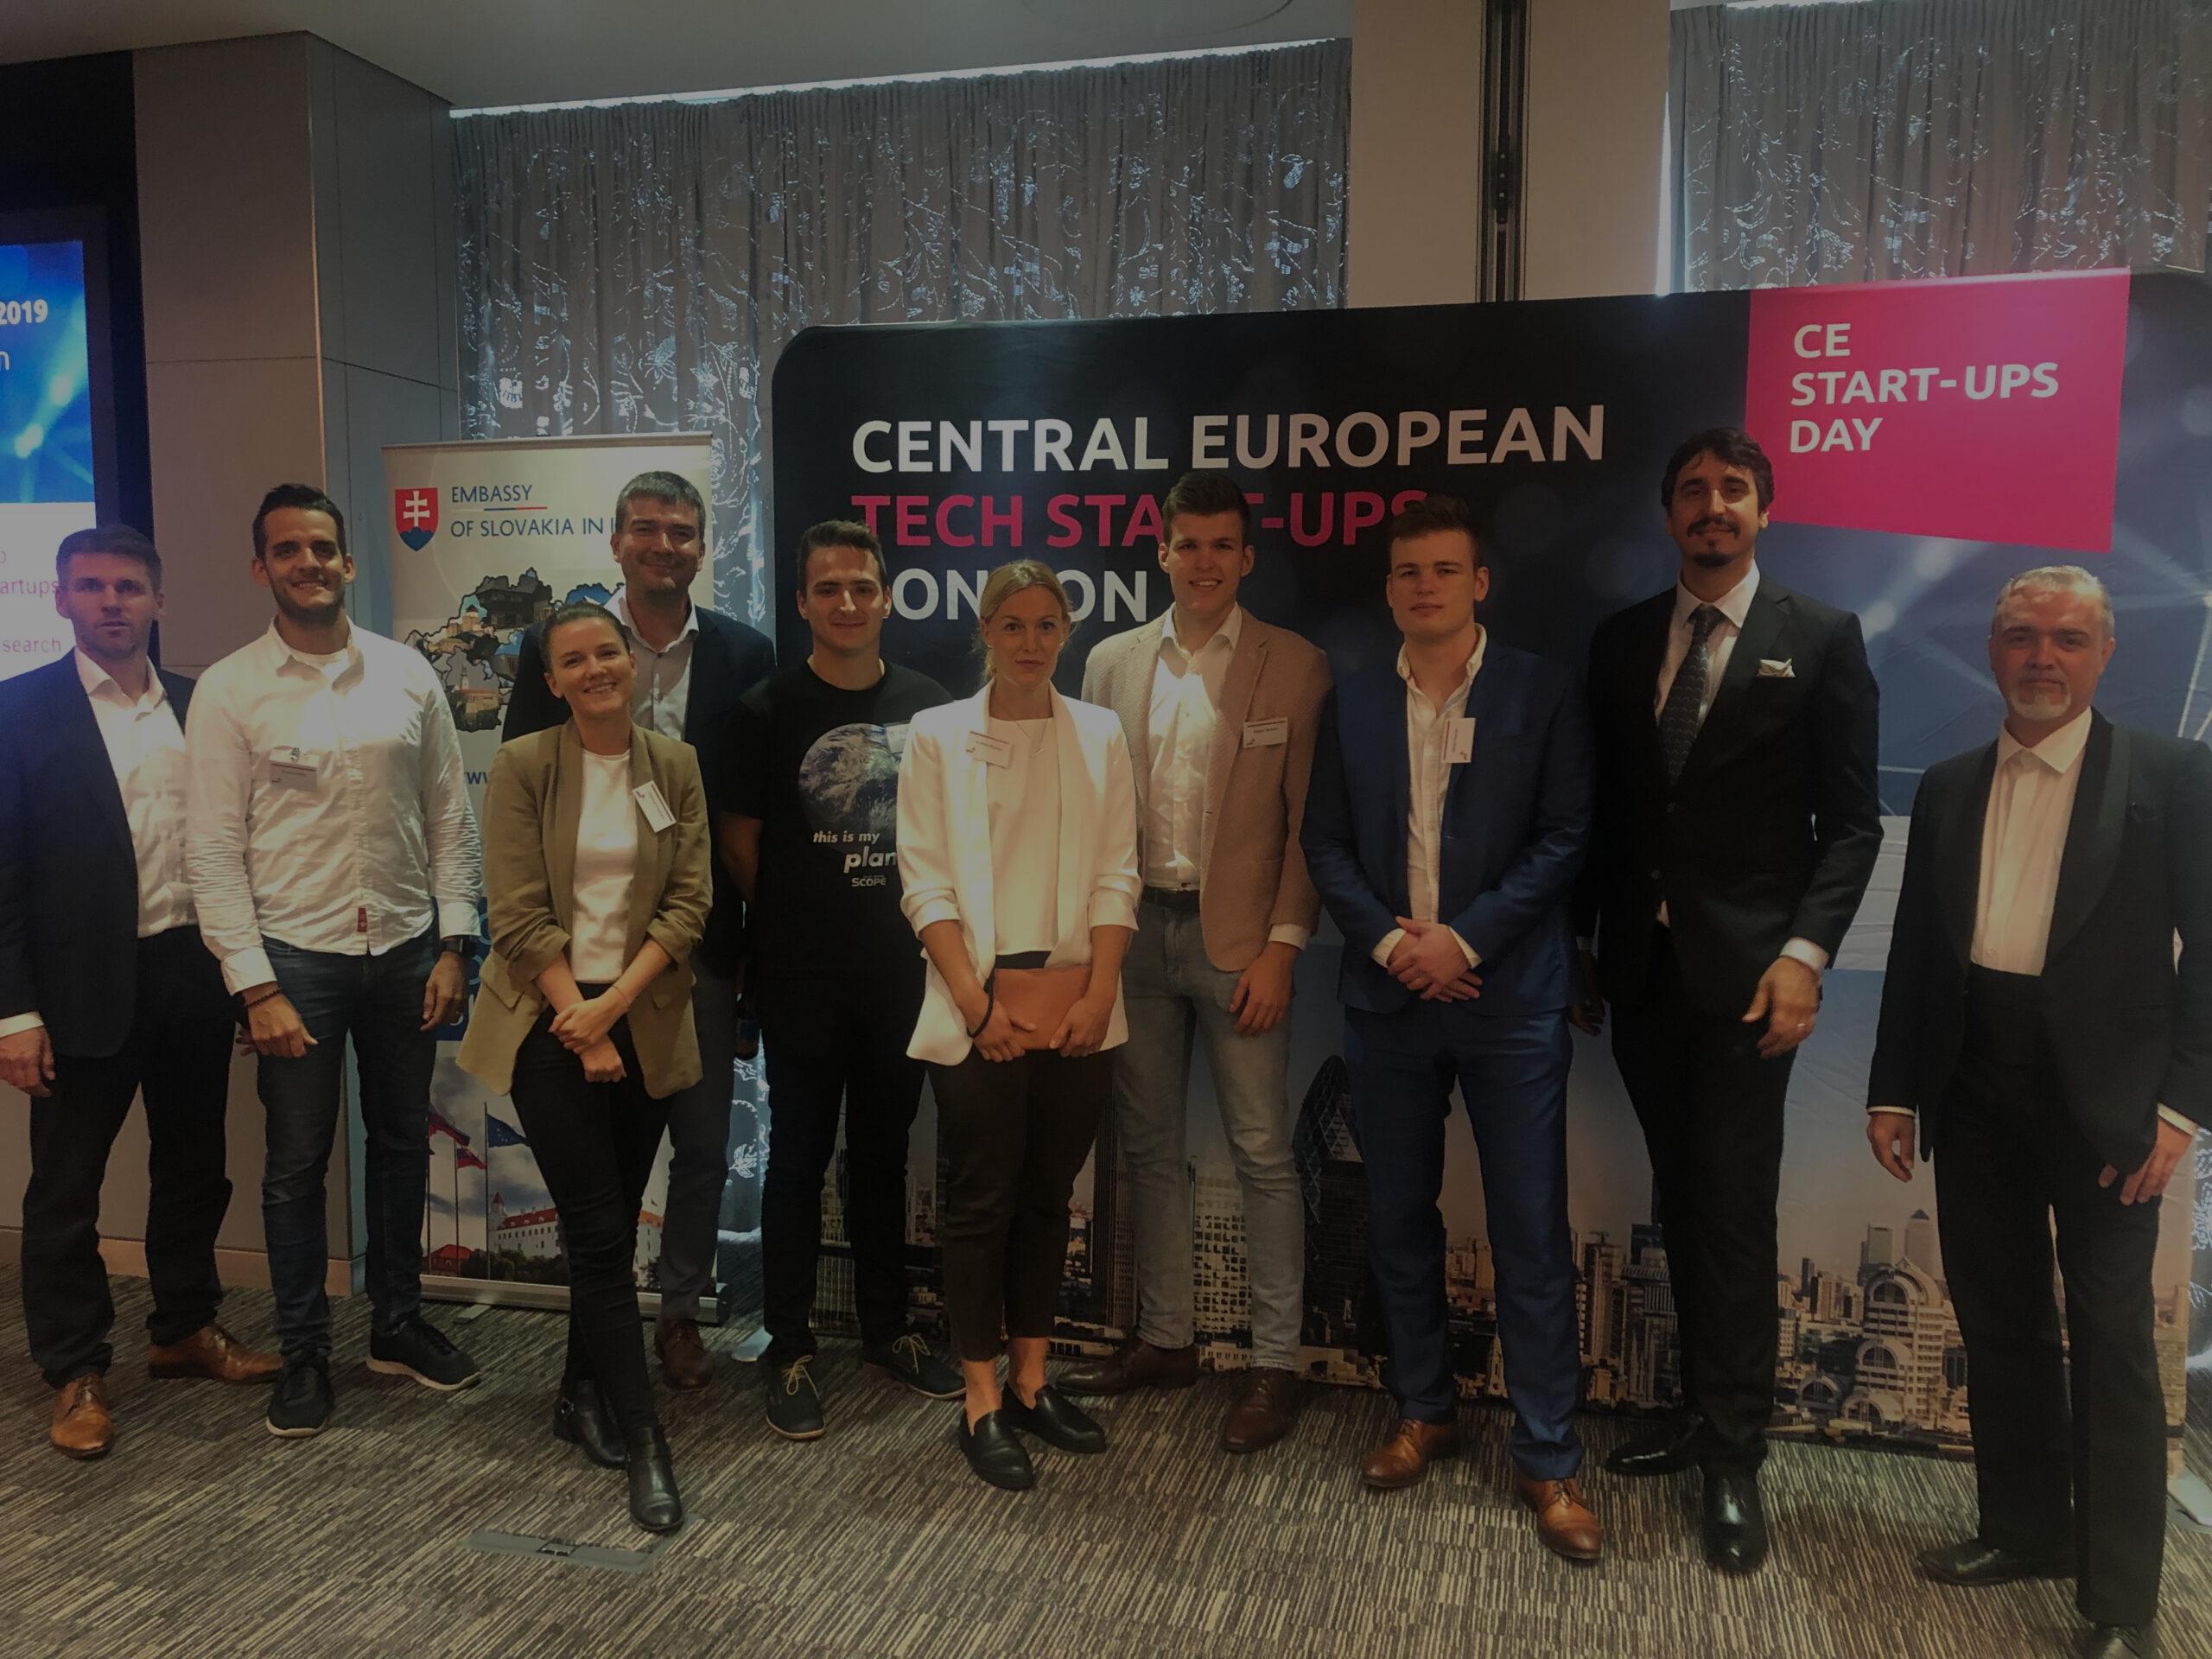 Central European Startups London